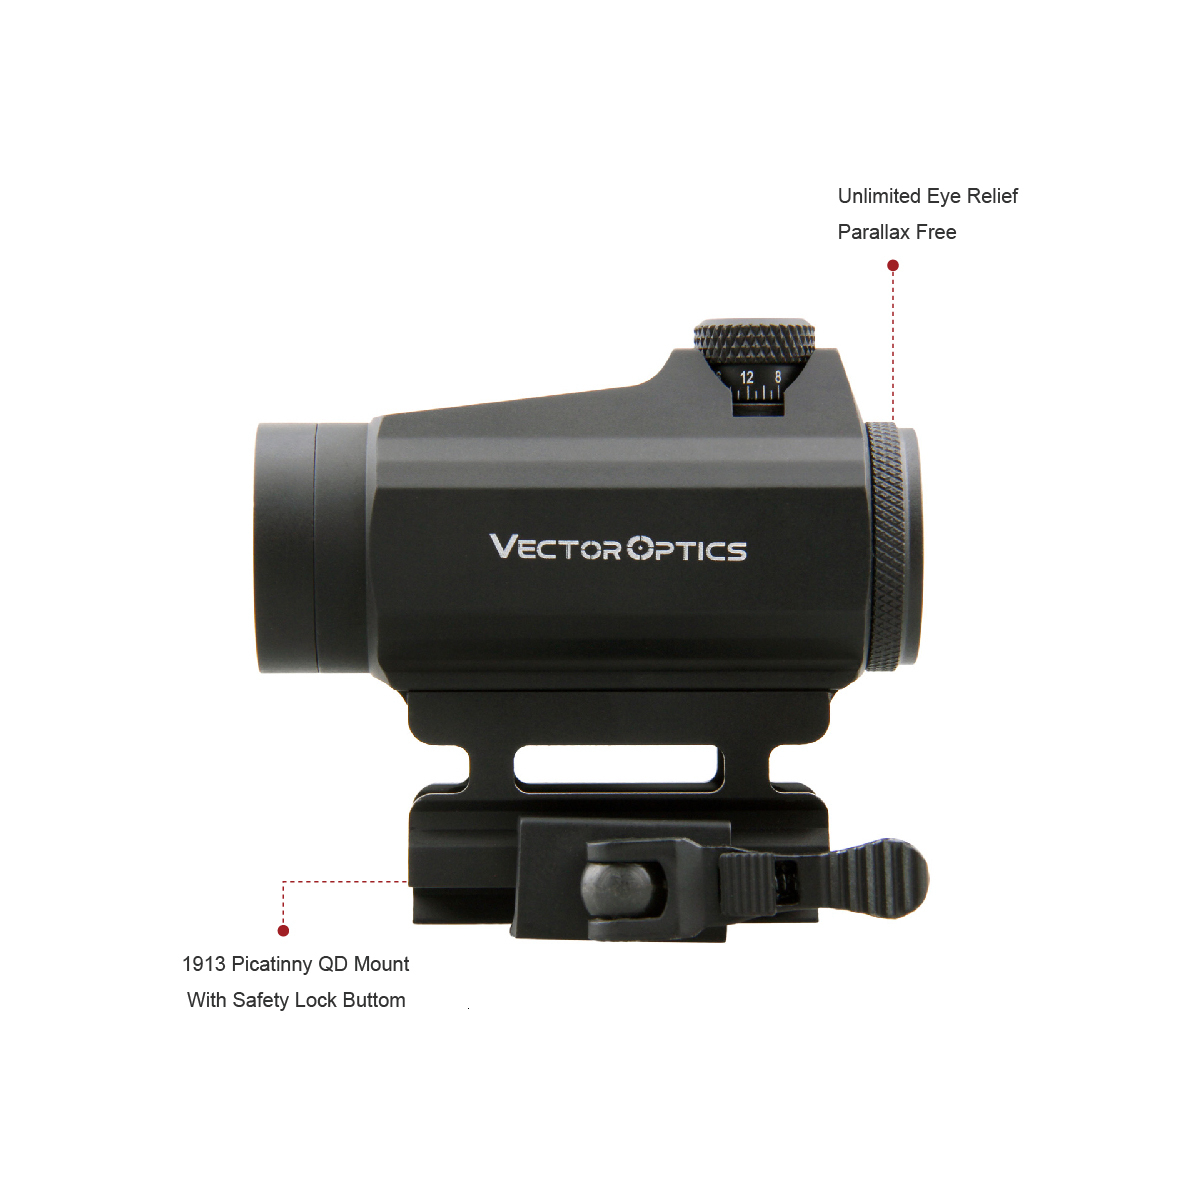 Red Dot Scope Sight Qd-Mount Vector-Optics Airsoft 1x22 Real-Firearms Maverick Tactical